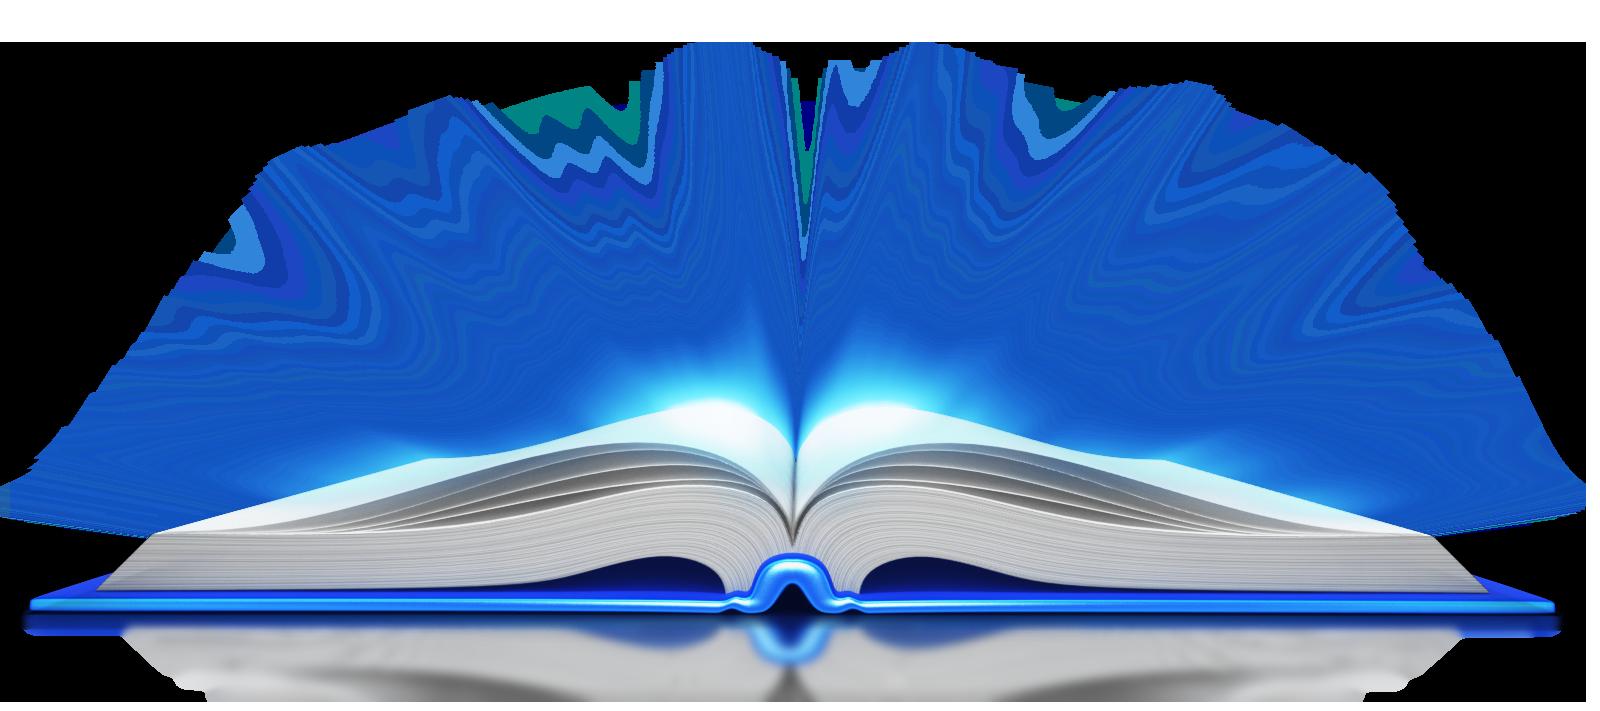 Book PNG Transparent Book.PNG Images..